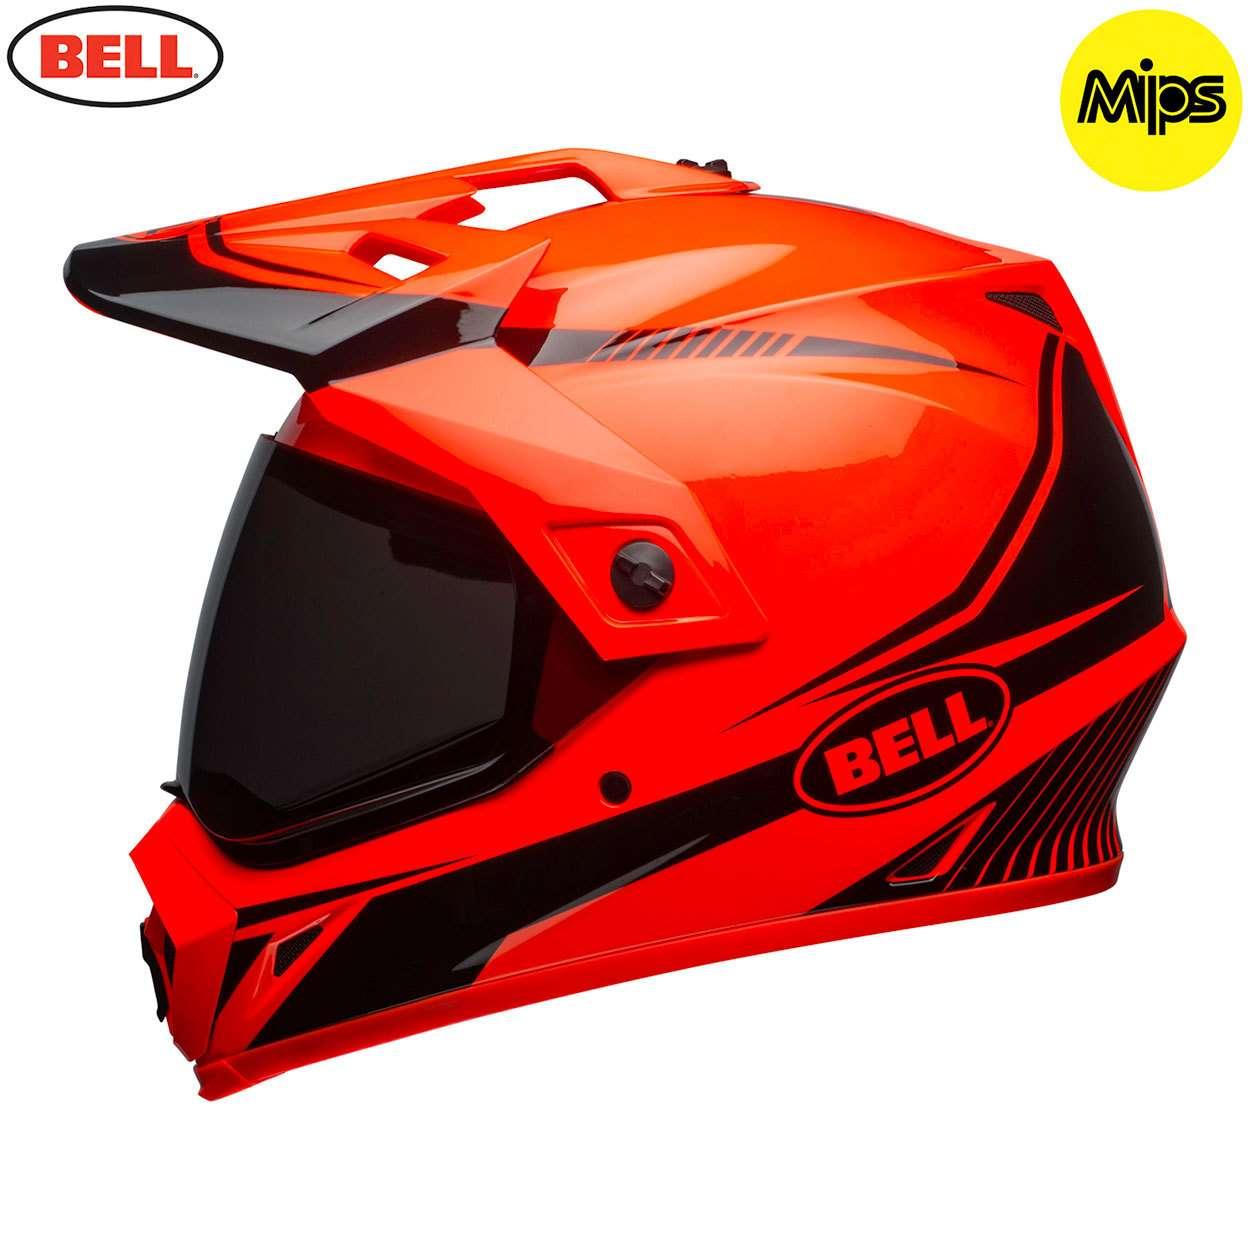 Bell MX 2018 MX-9 Adventure MIPS Motorcycle Motorbike Helmet Torch Orange//Blk